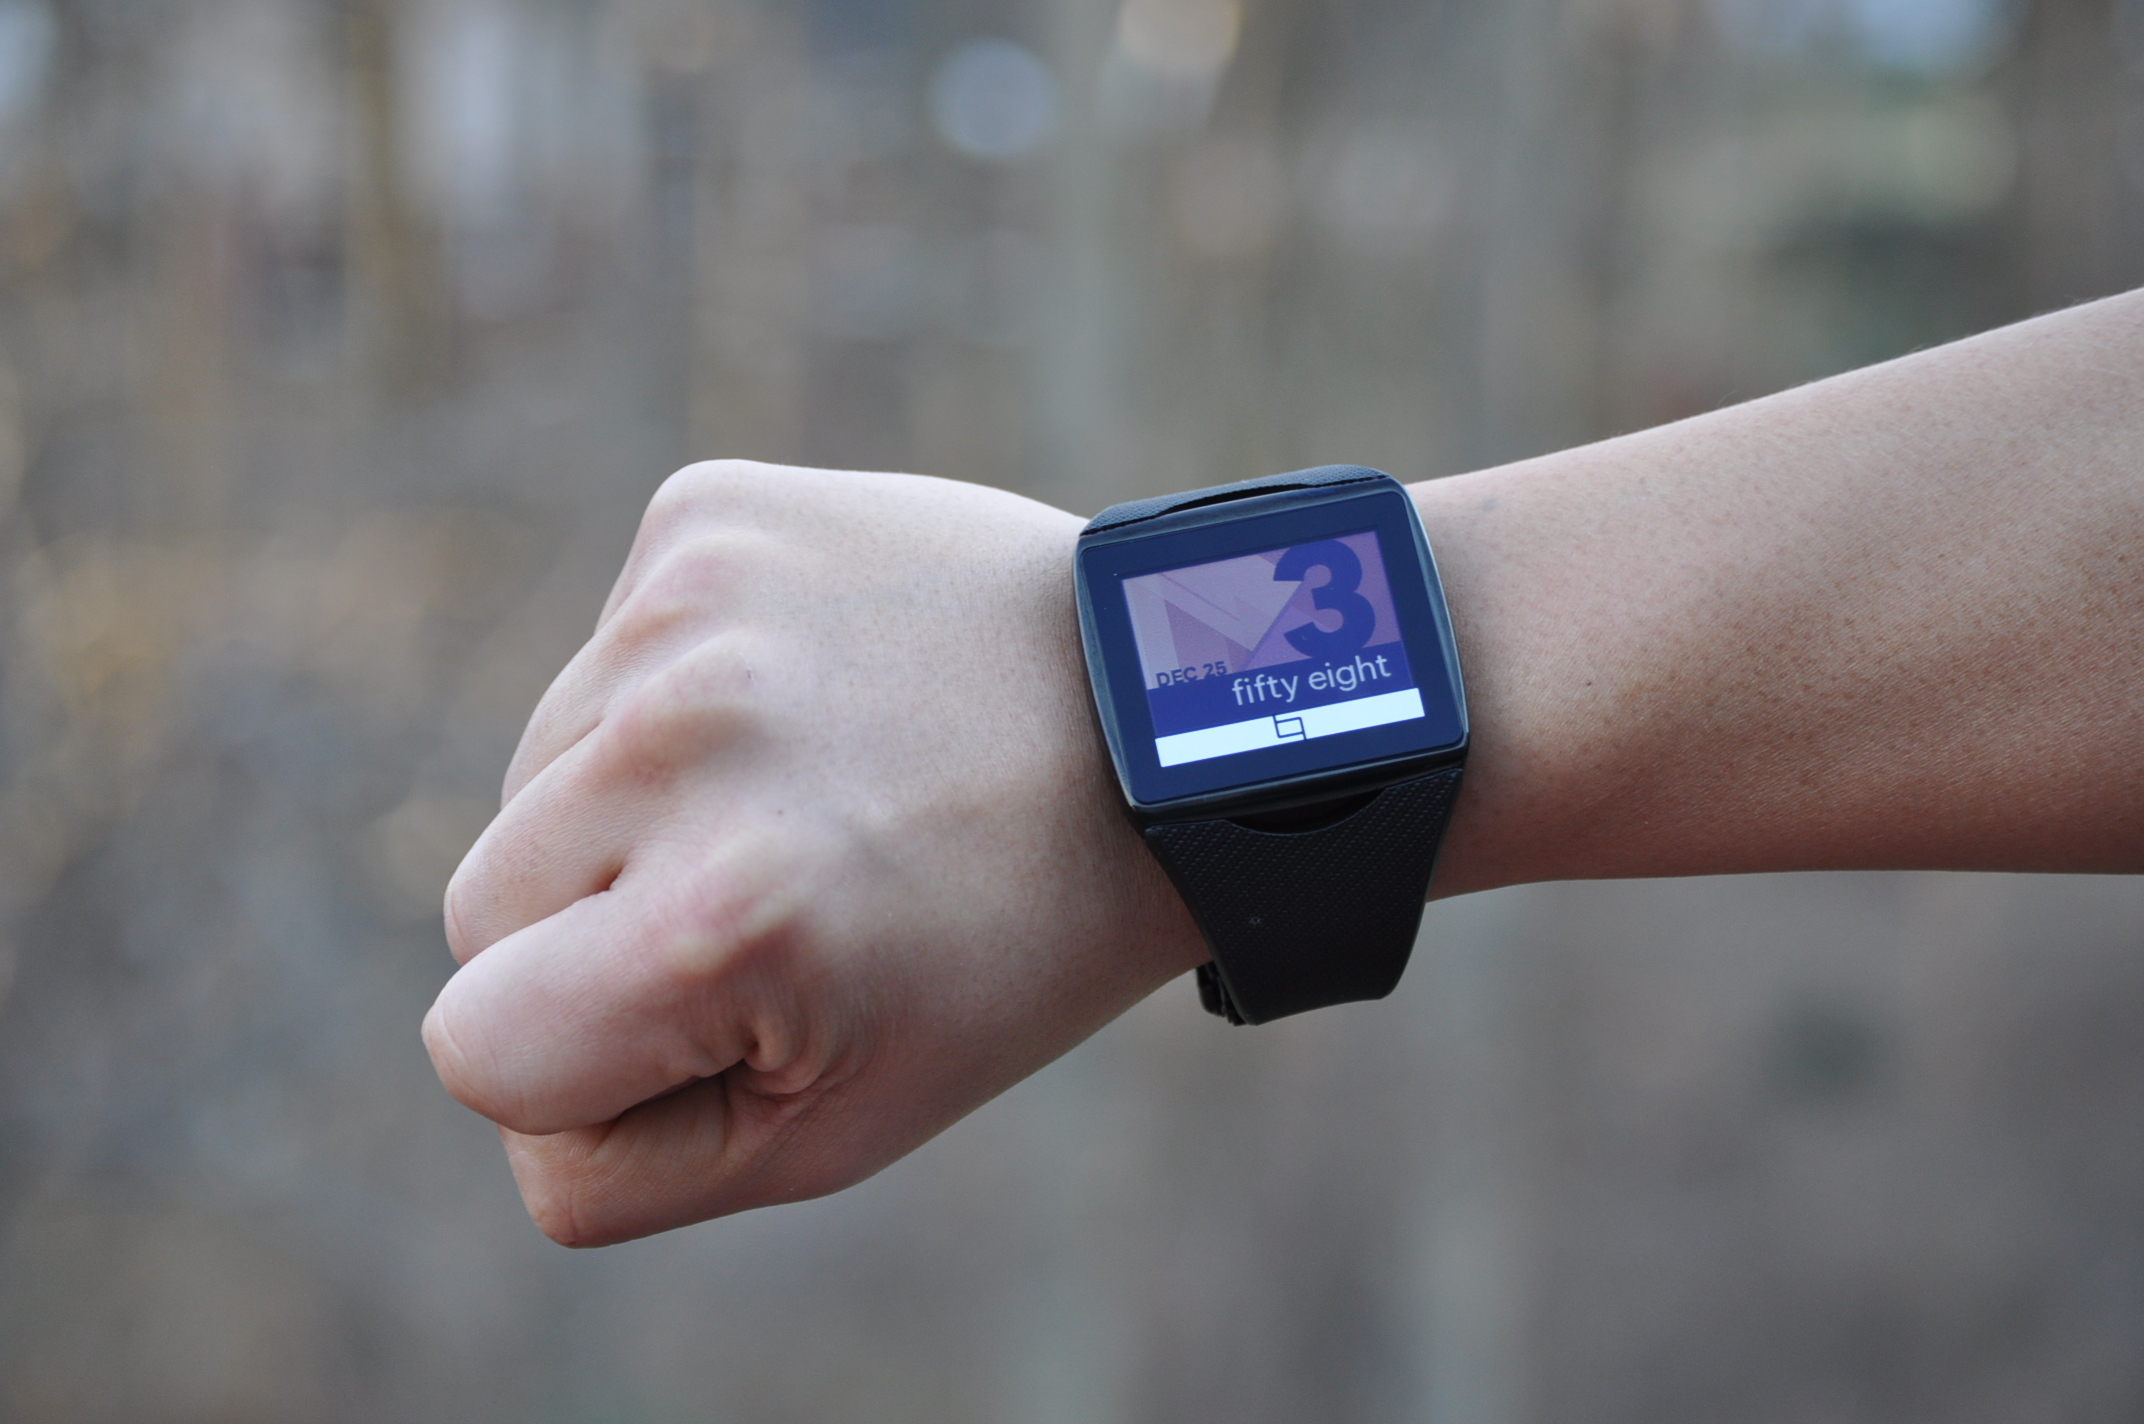 Qualcomm's Toq Smartwatch Needs More Time